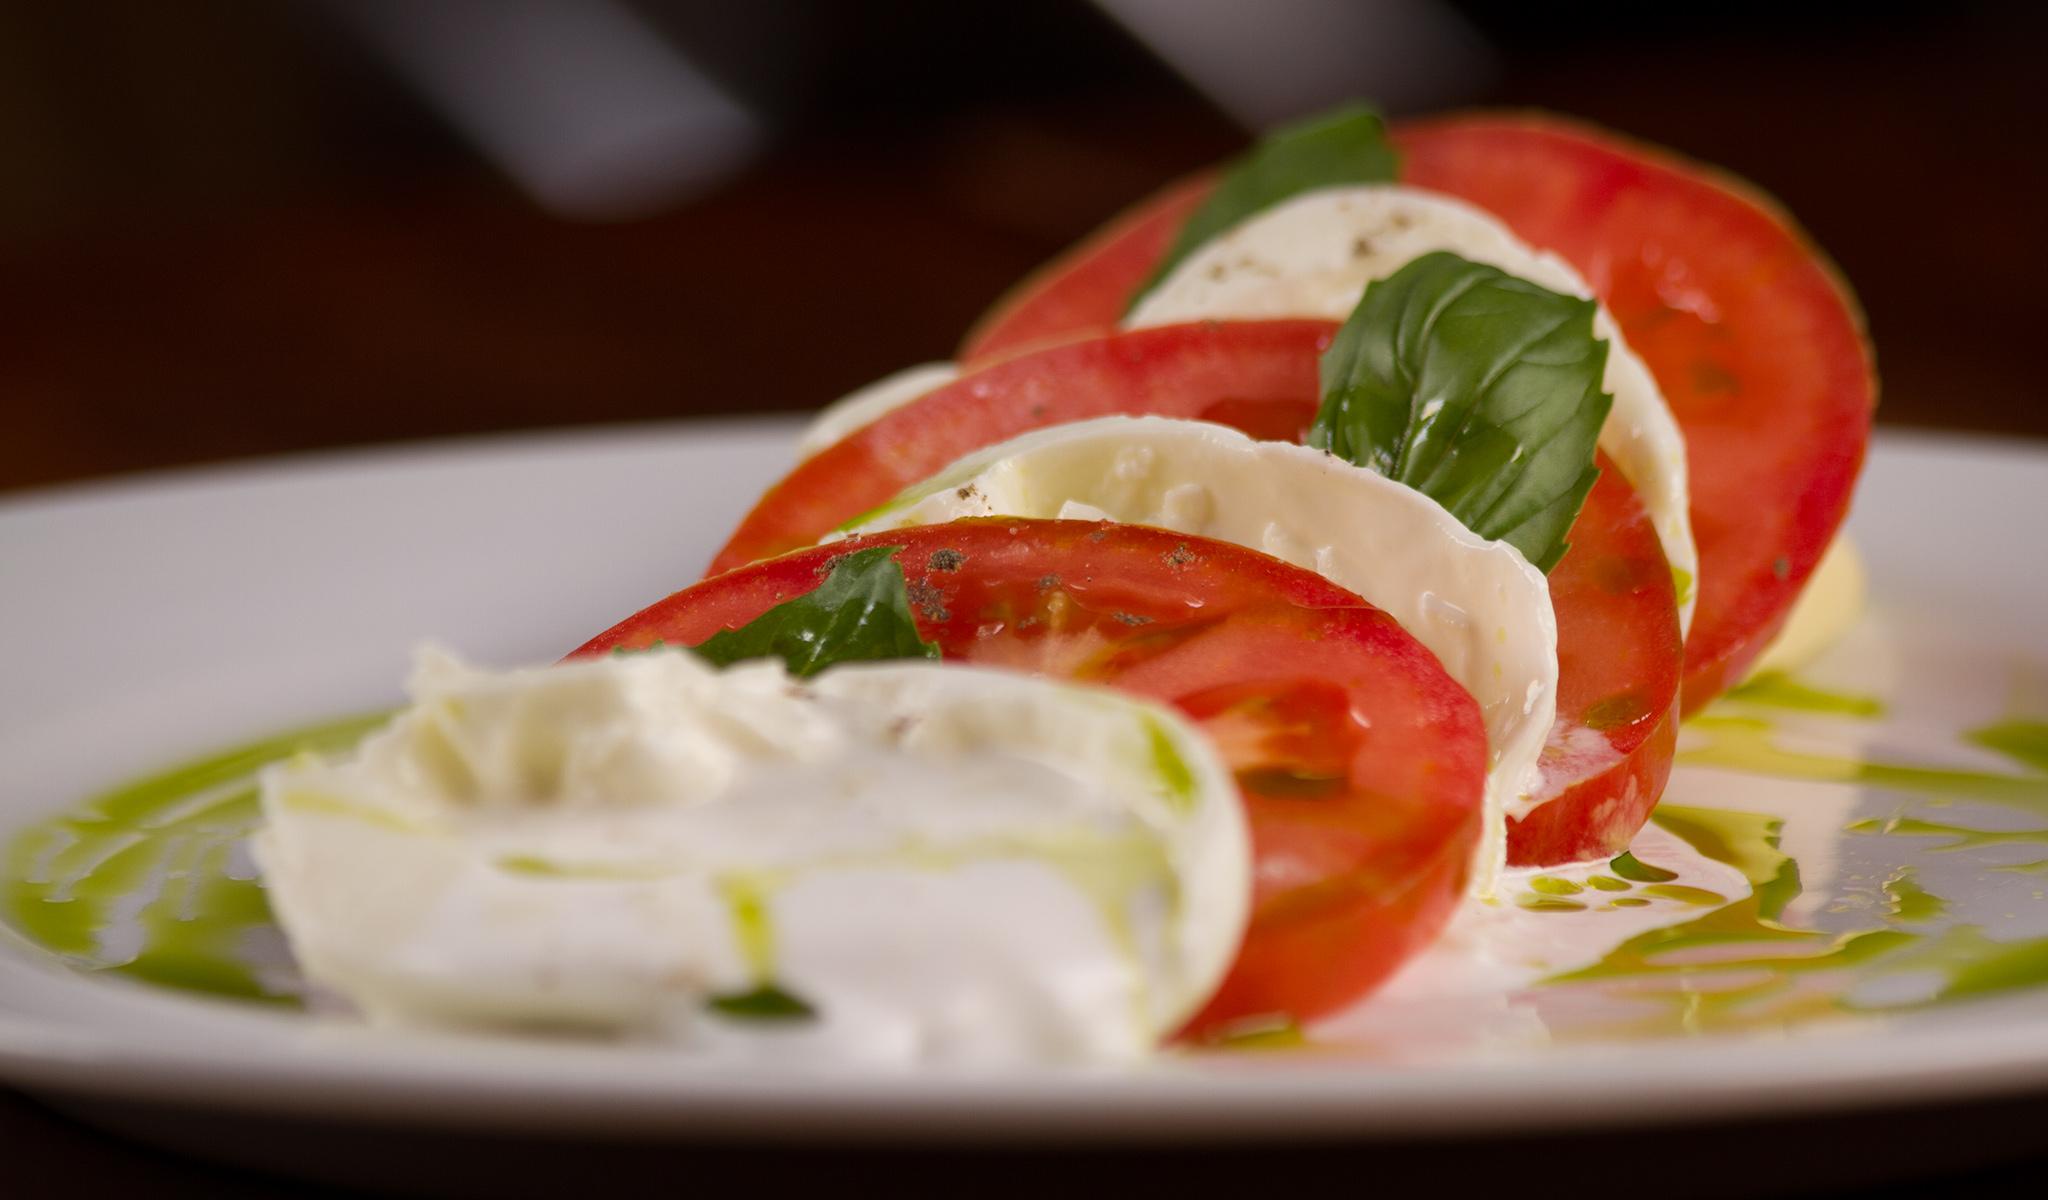 Restaurante champagne bar de comida italiana en bogot for Restaurantes de comida italiana